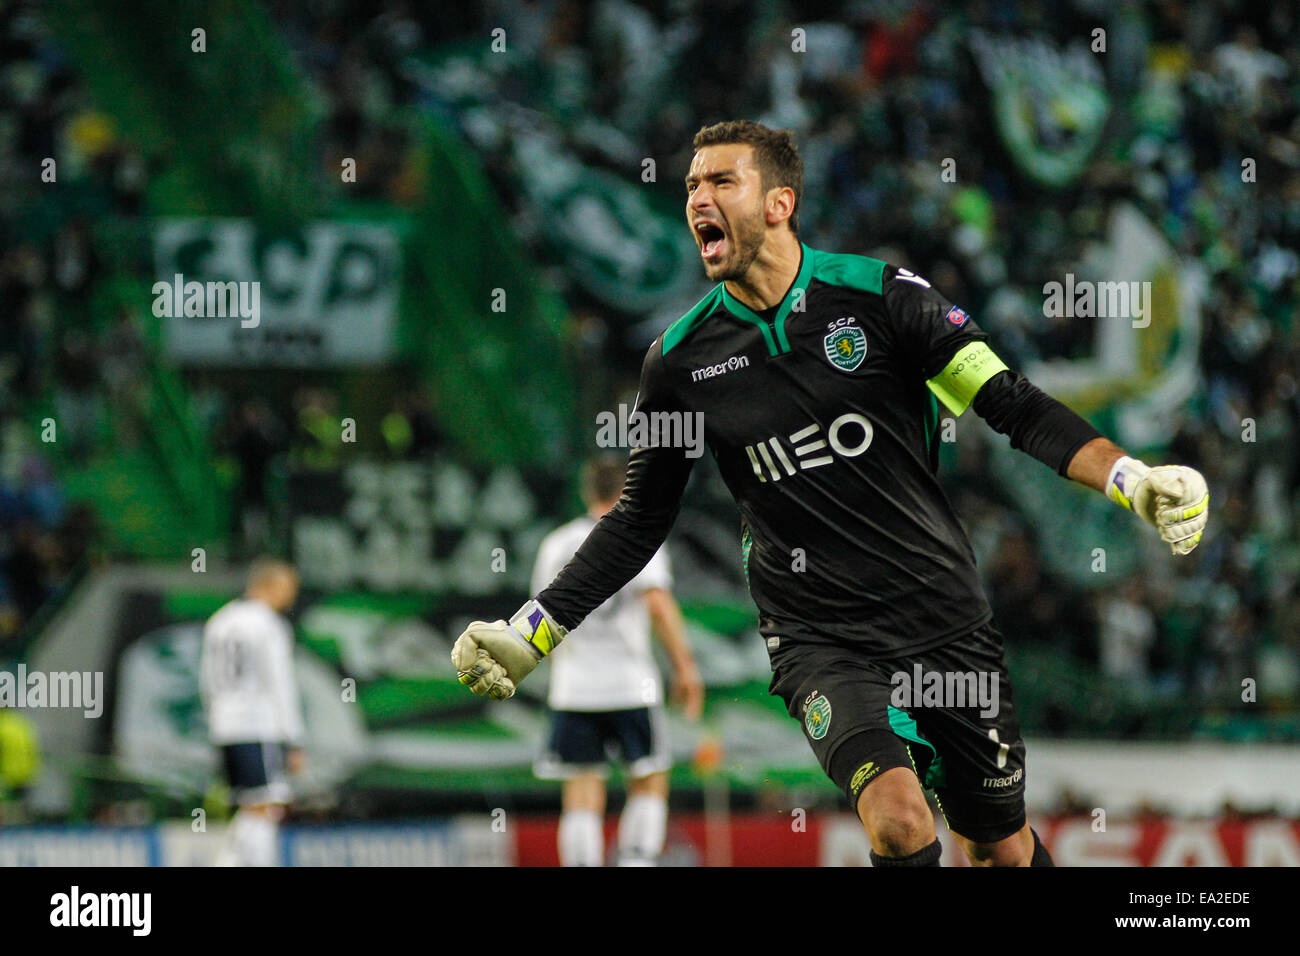 Sporting goalkeeper Rui Patrcio 1 reacts after Sporting scoring